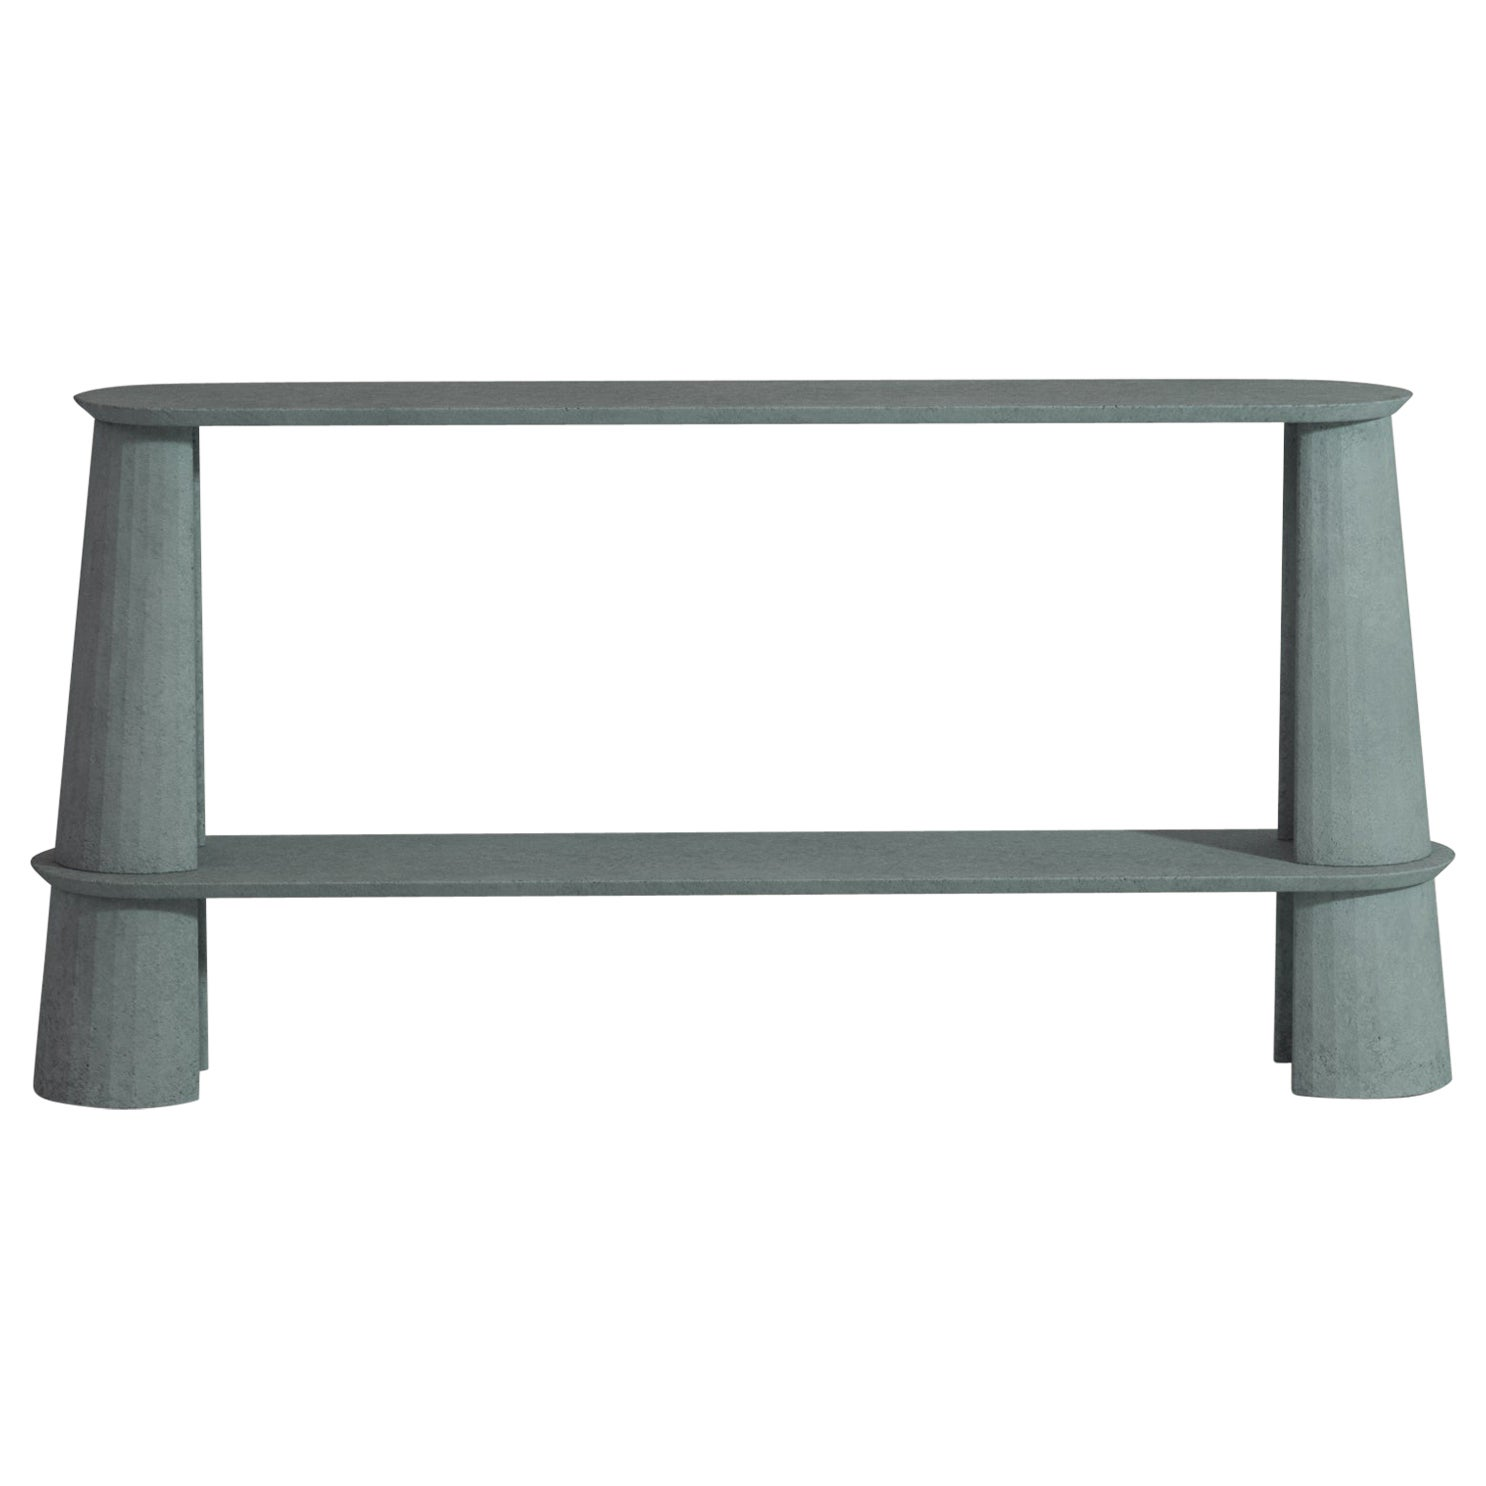 21st Century Studio Irvine Fusto Side Console Table Concrete Cement Ultramarine